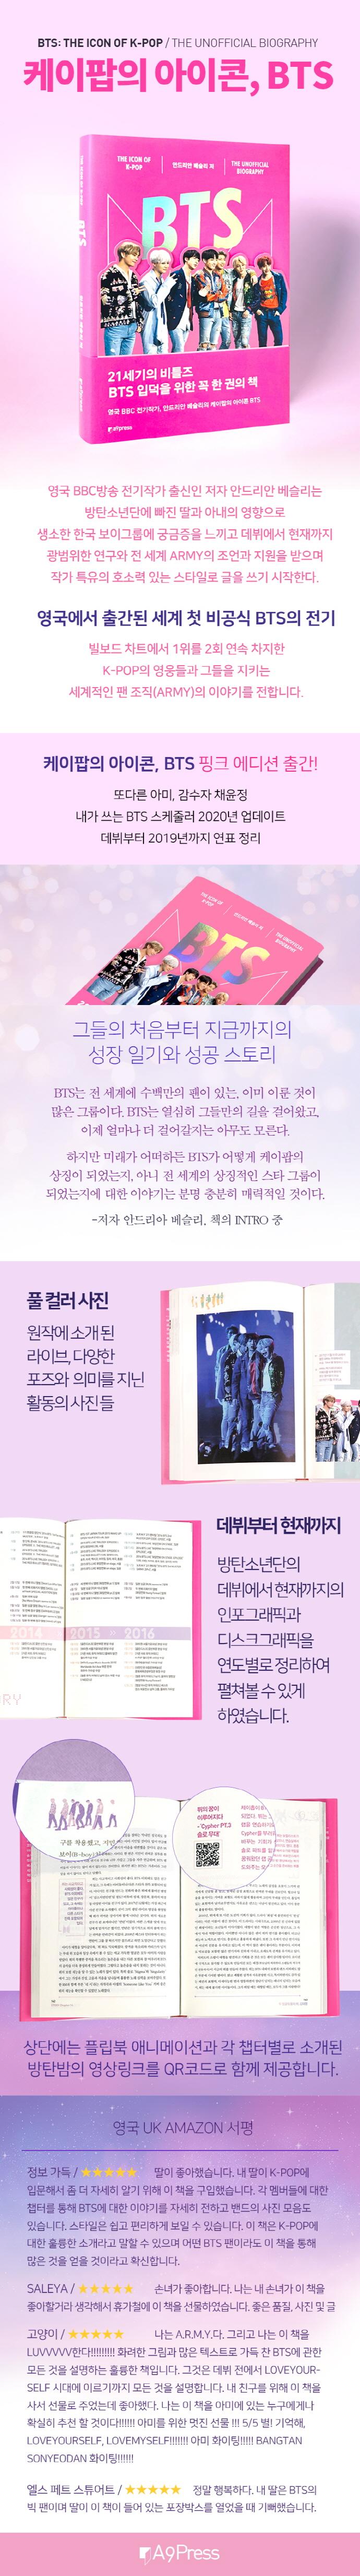 BTS: The Icon of K-Pop(케이팝의 아이콘)(양장본 HardCover) 도서 상세이미지